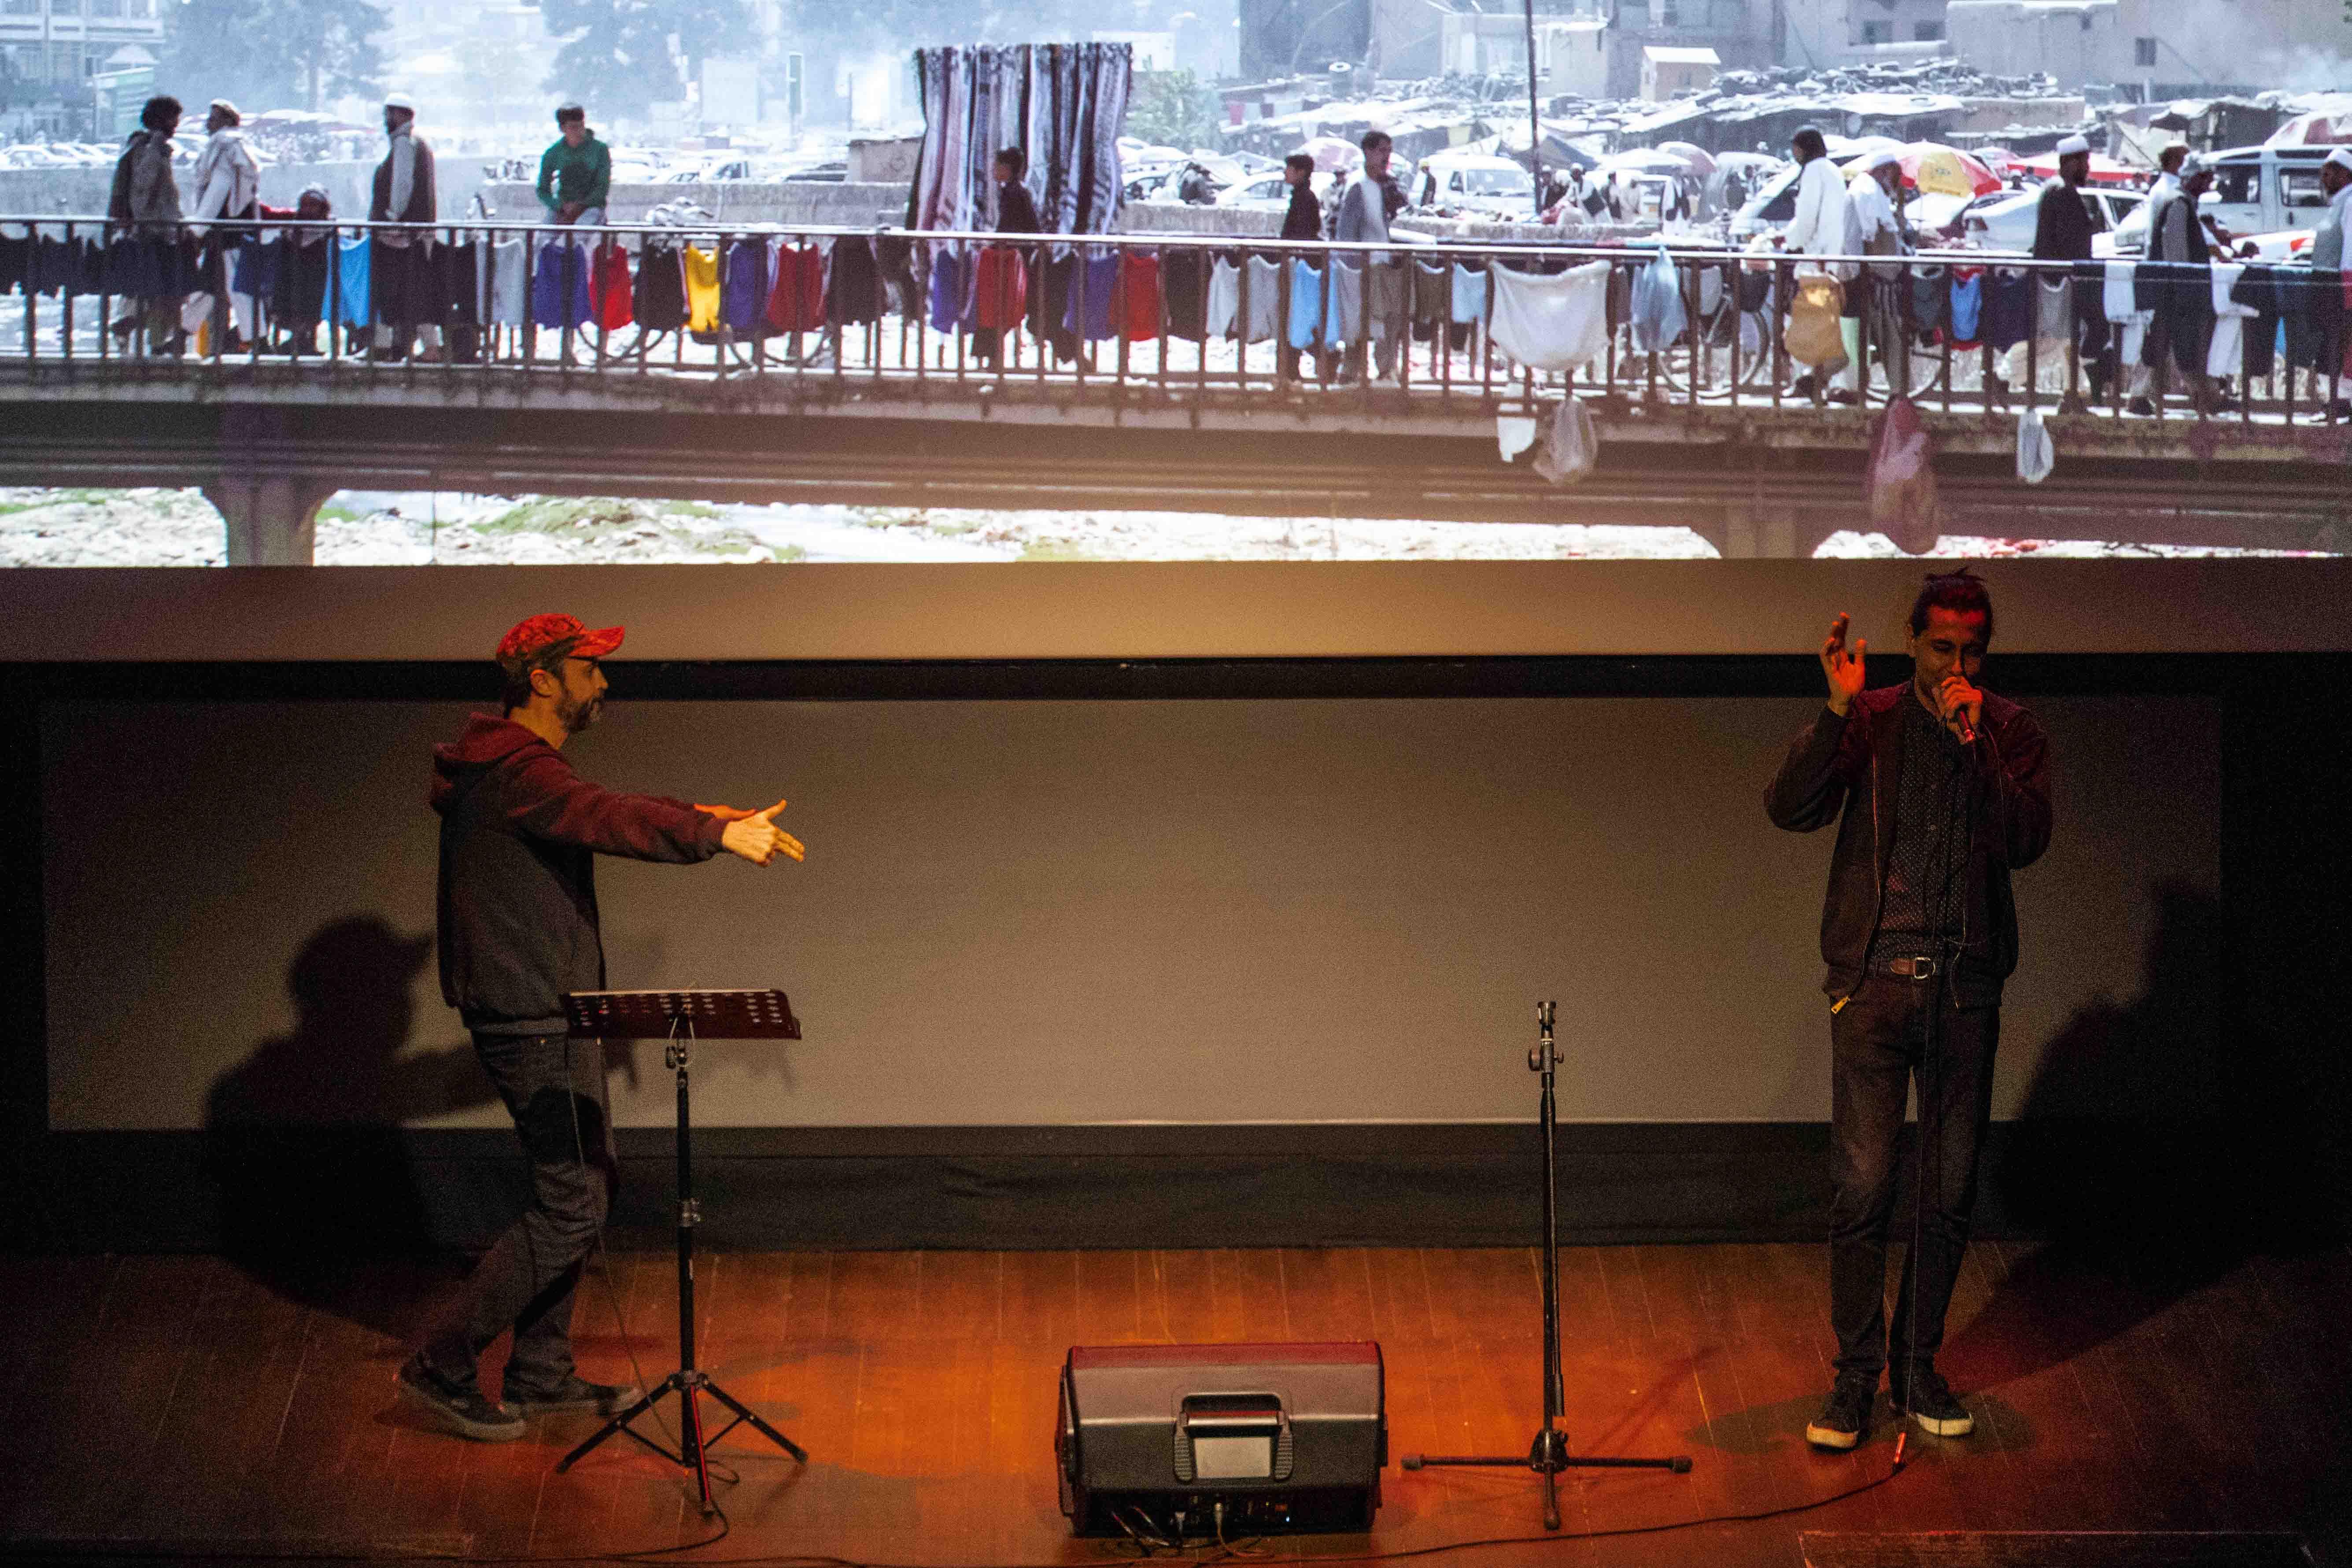 Closing Night Middle East Now_Rockabul performance by Travis Beard and Yusoof Ahmad Shah © Carlos Folgoso / Massimo Sestini